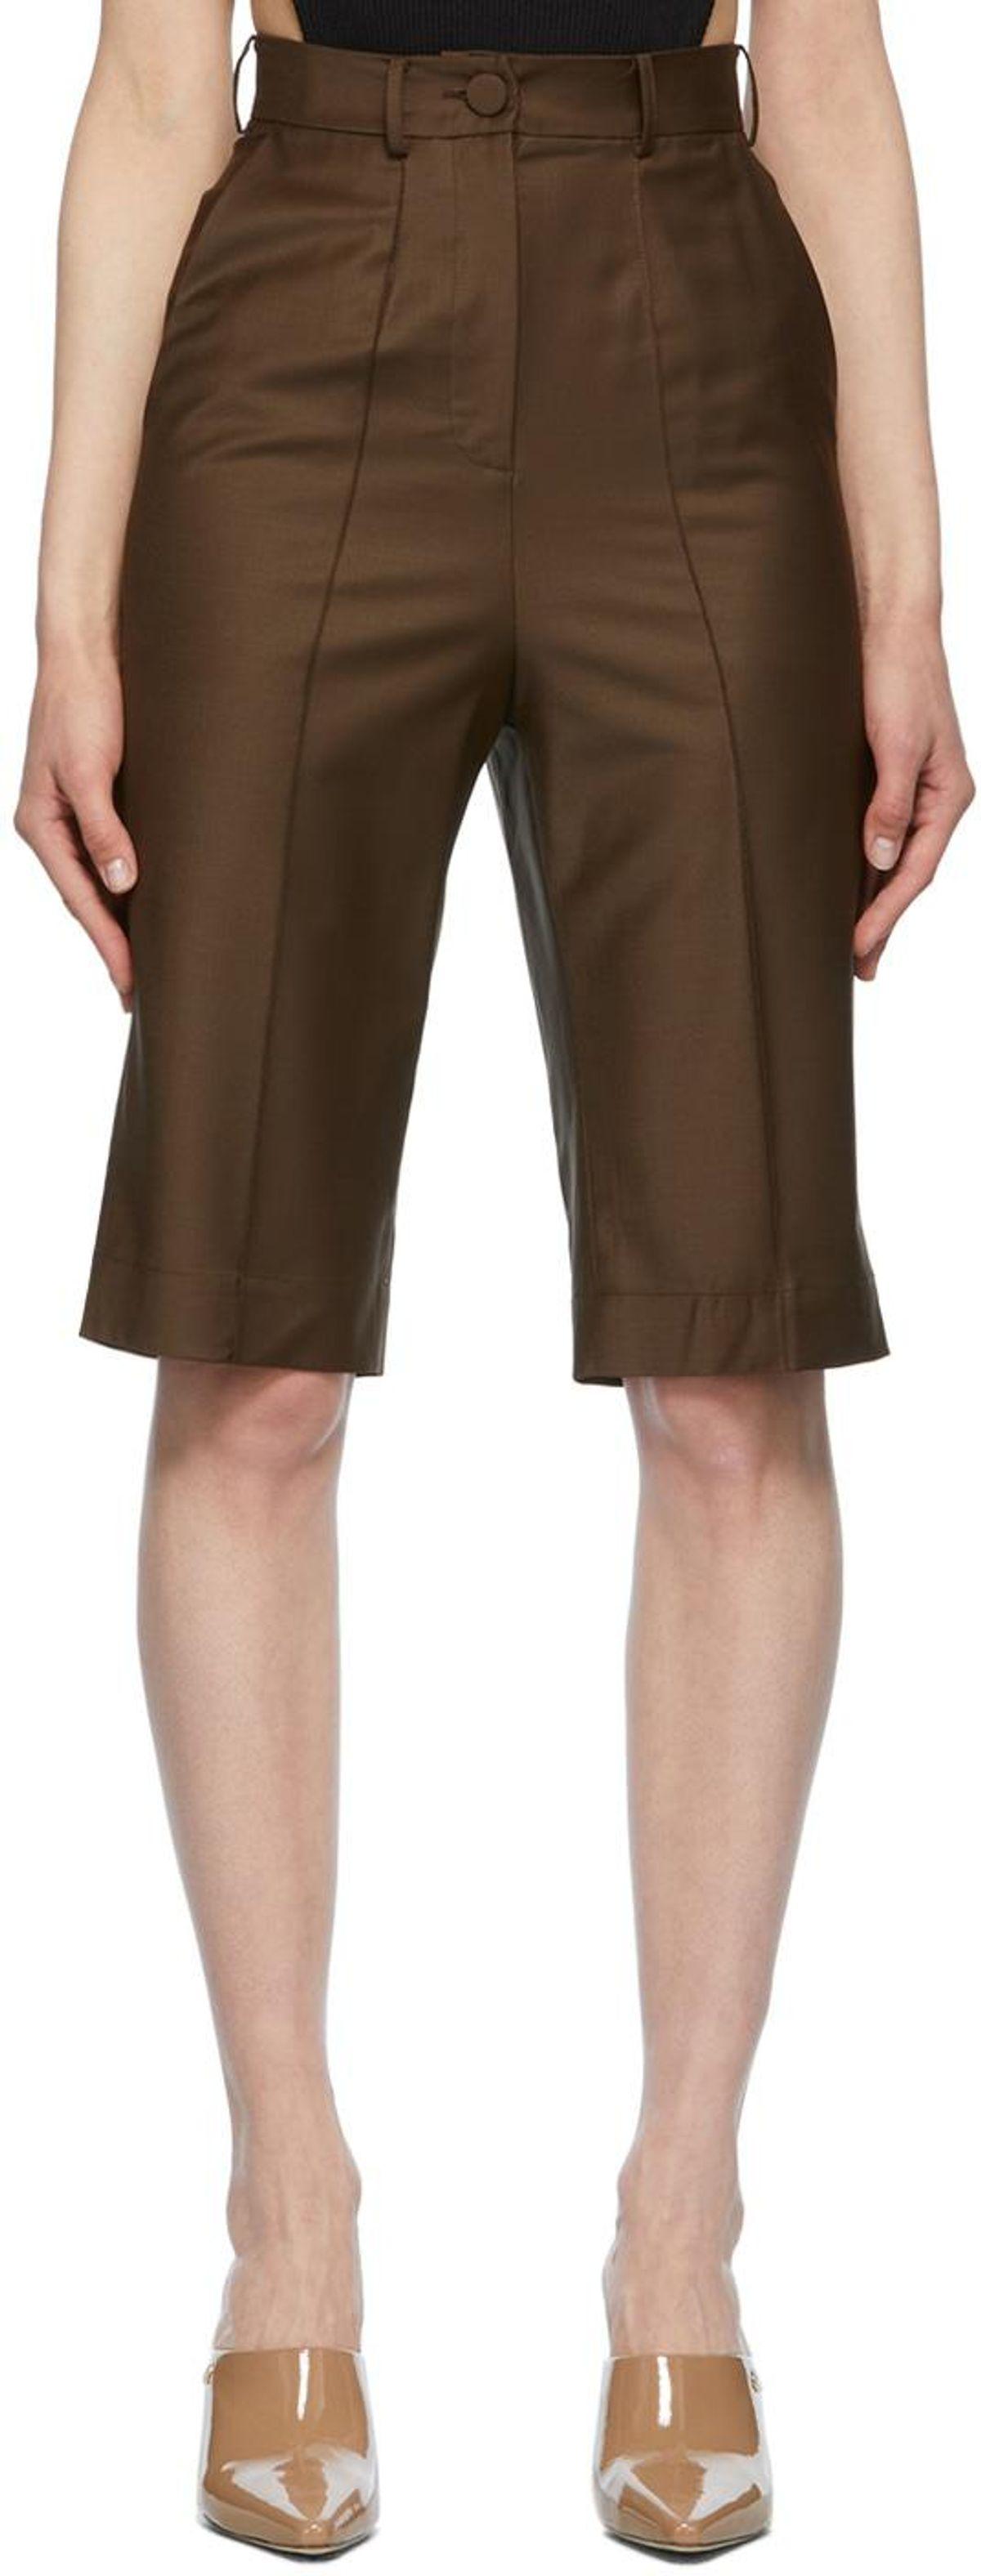 Brown Tropical Wool Shorts